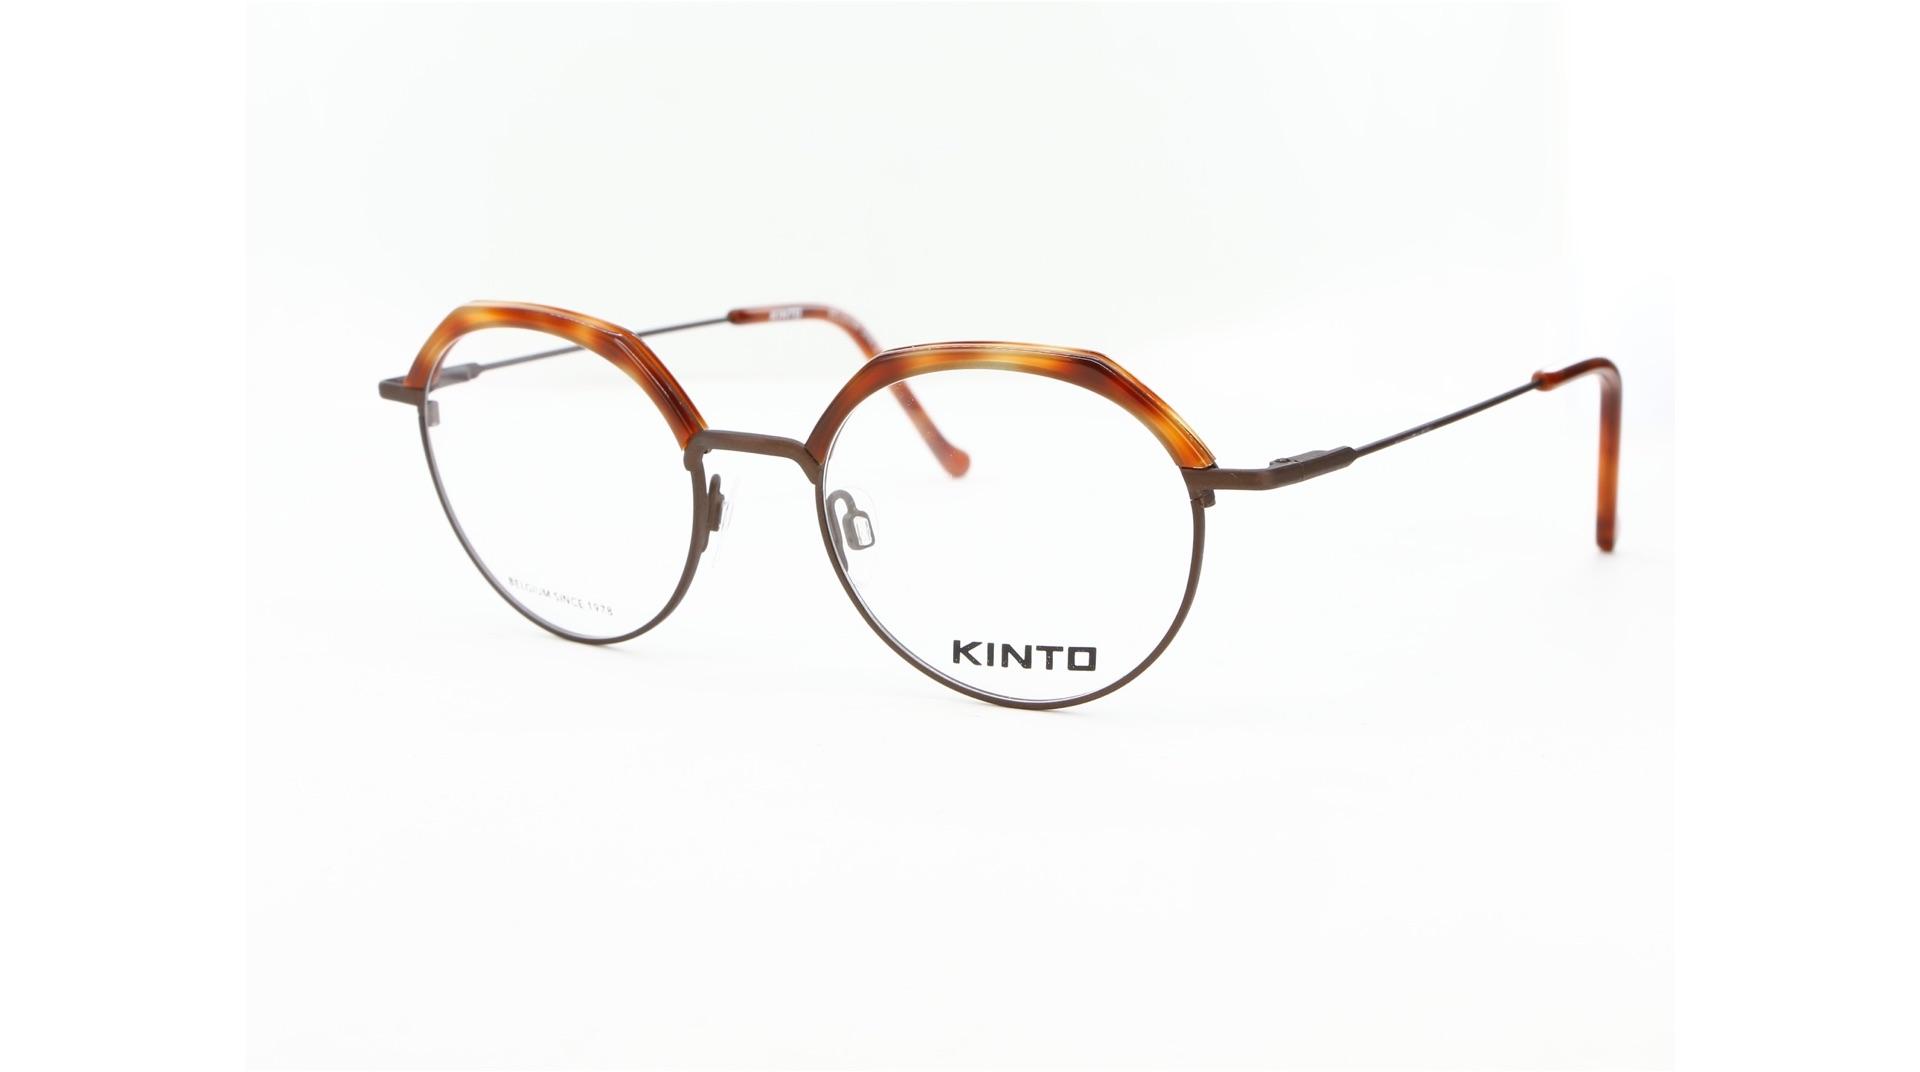 Kinto - ref: 81503